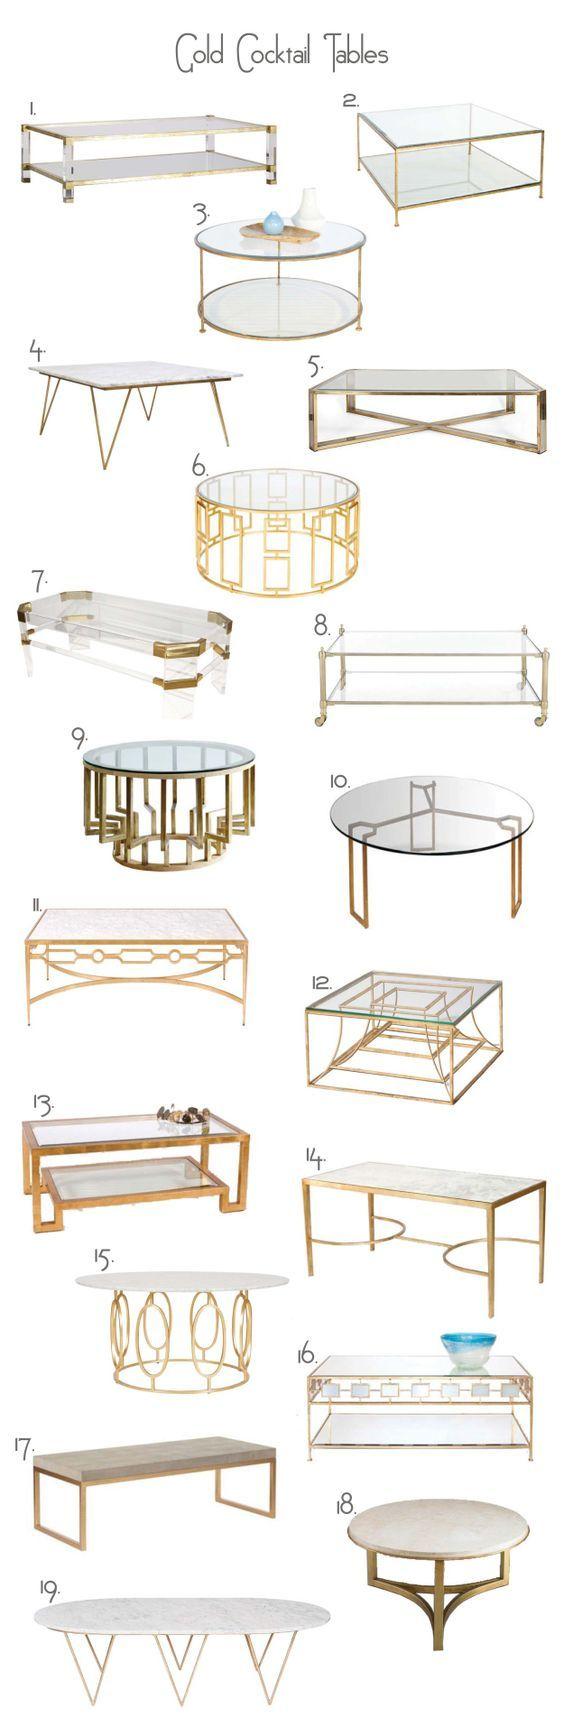 GOLD COCKTAIL TABLES  SEVENTY FIVE ARLINGTON